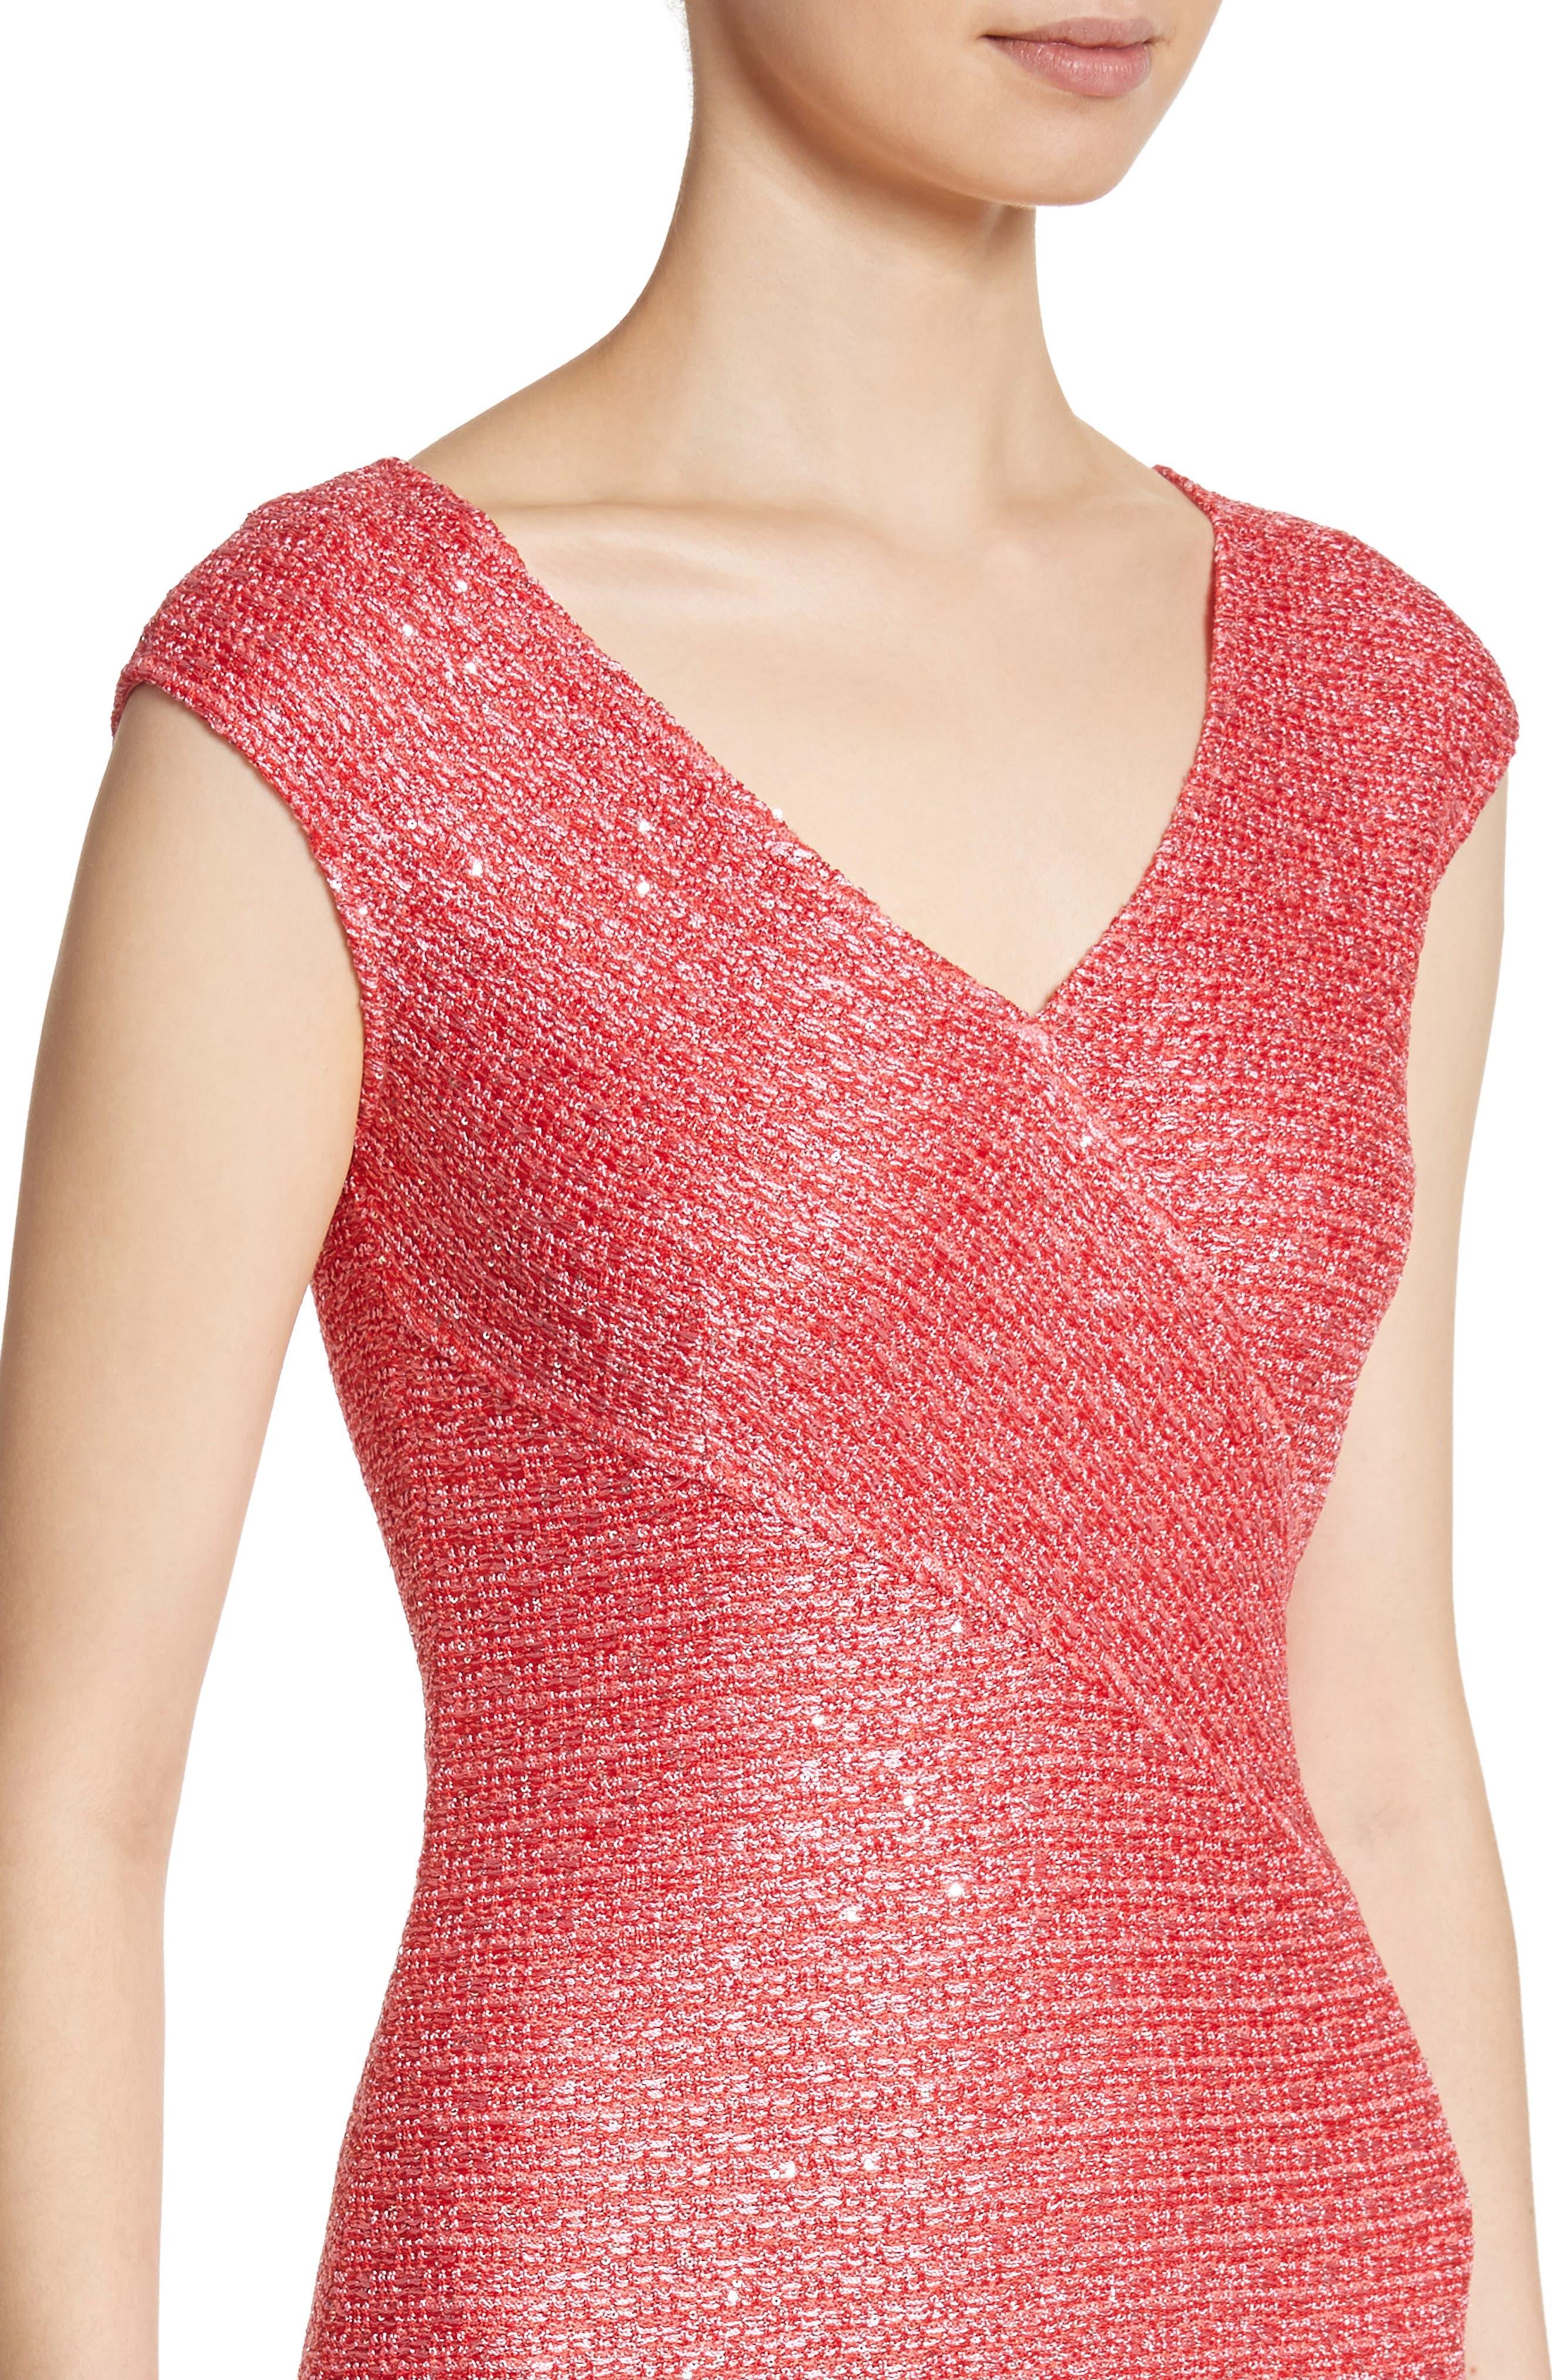 Hansh Knit Dress,                             Alternate thumbnail 4, color,                             Coral Multi